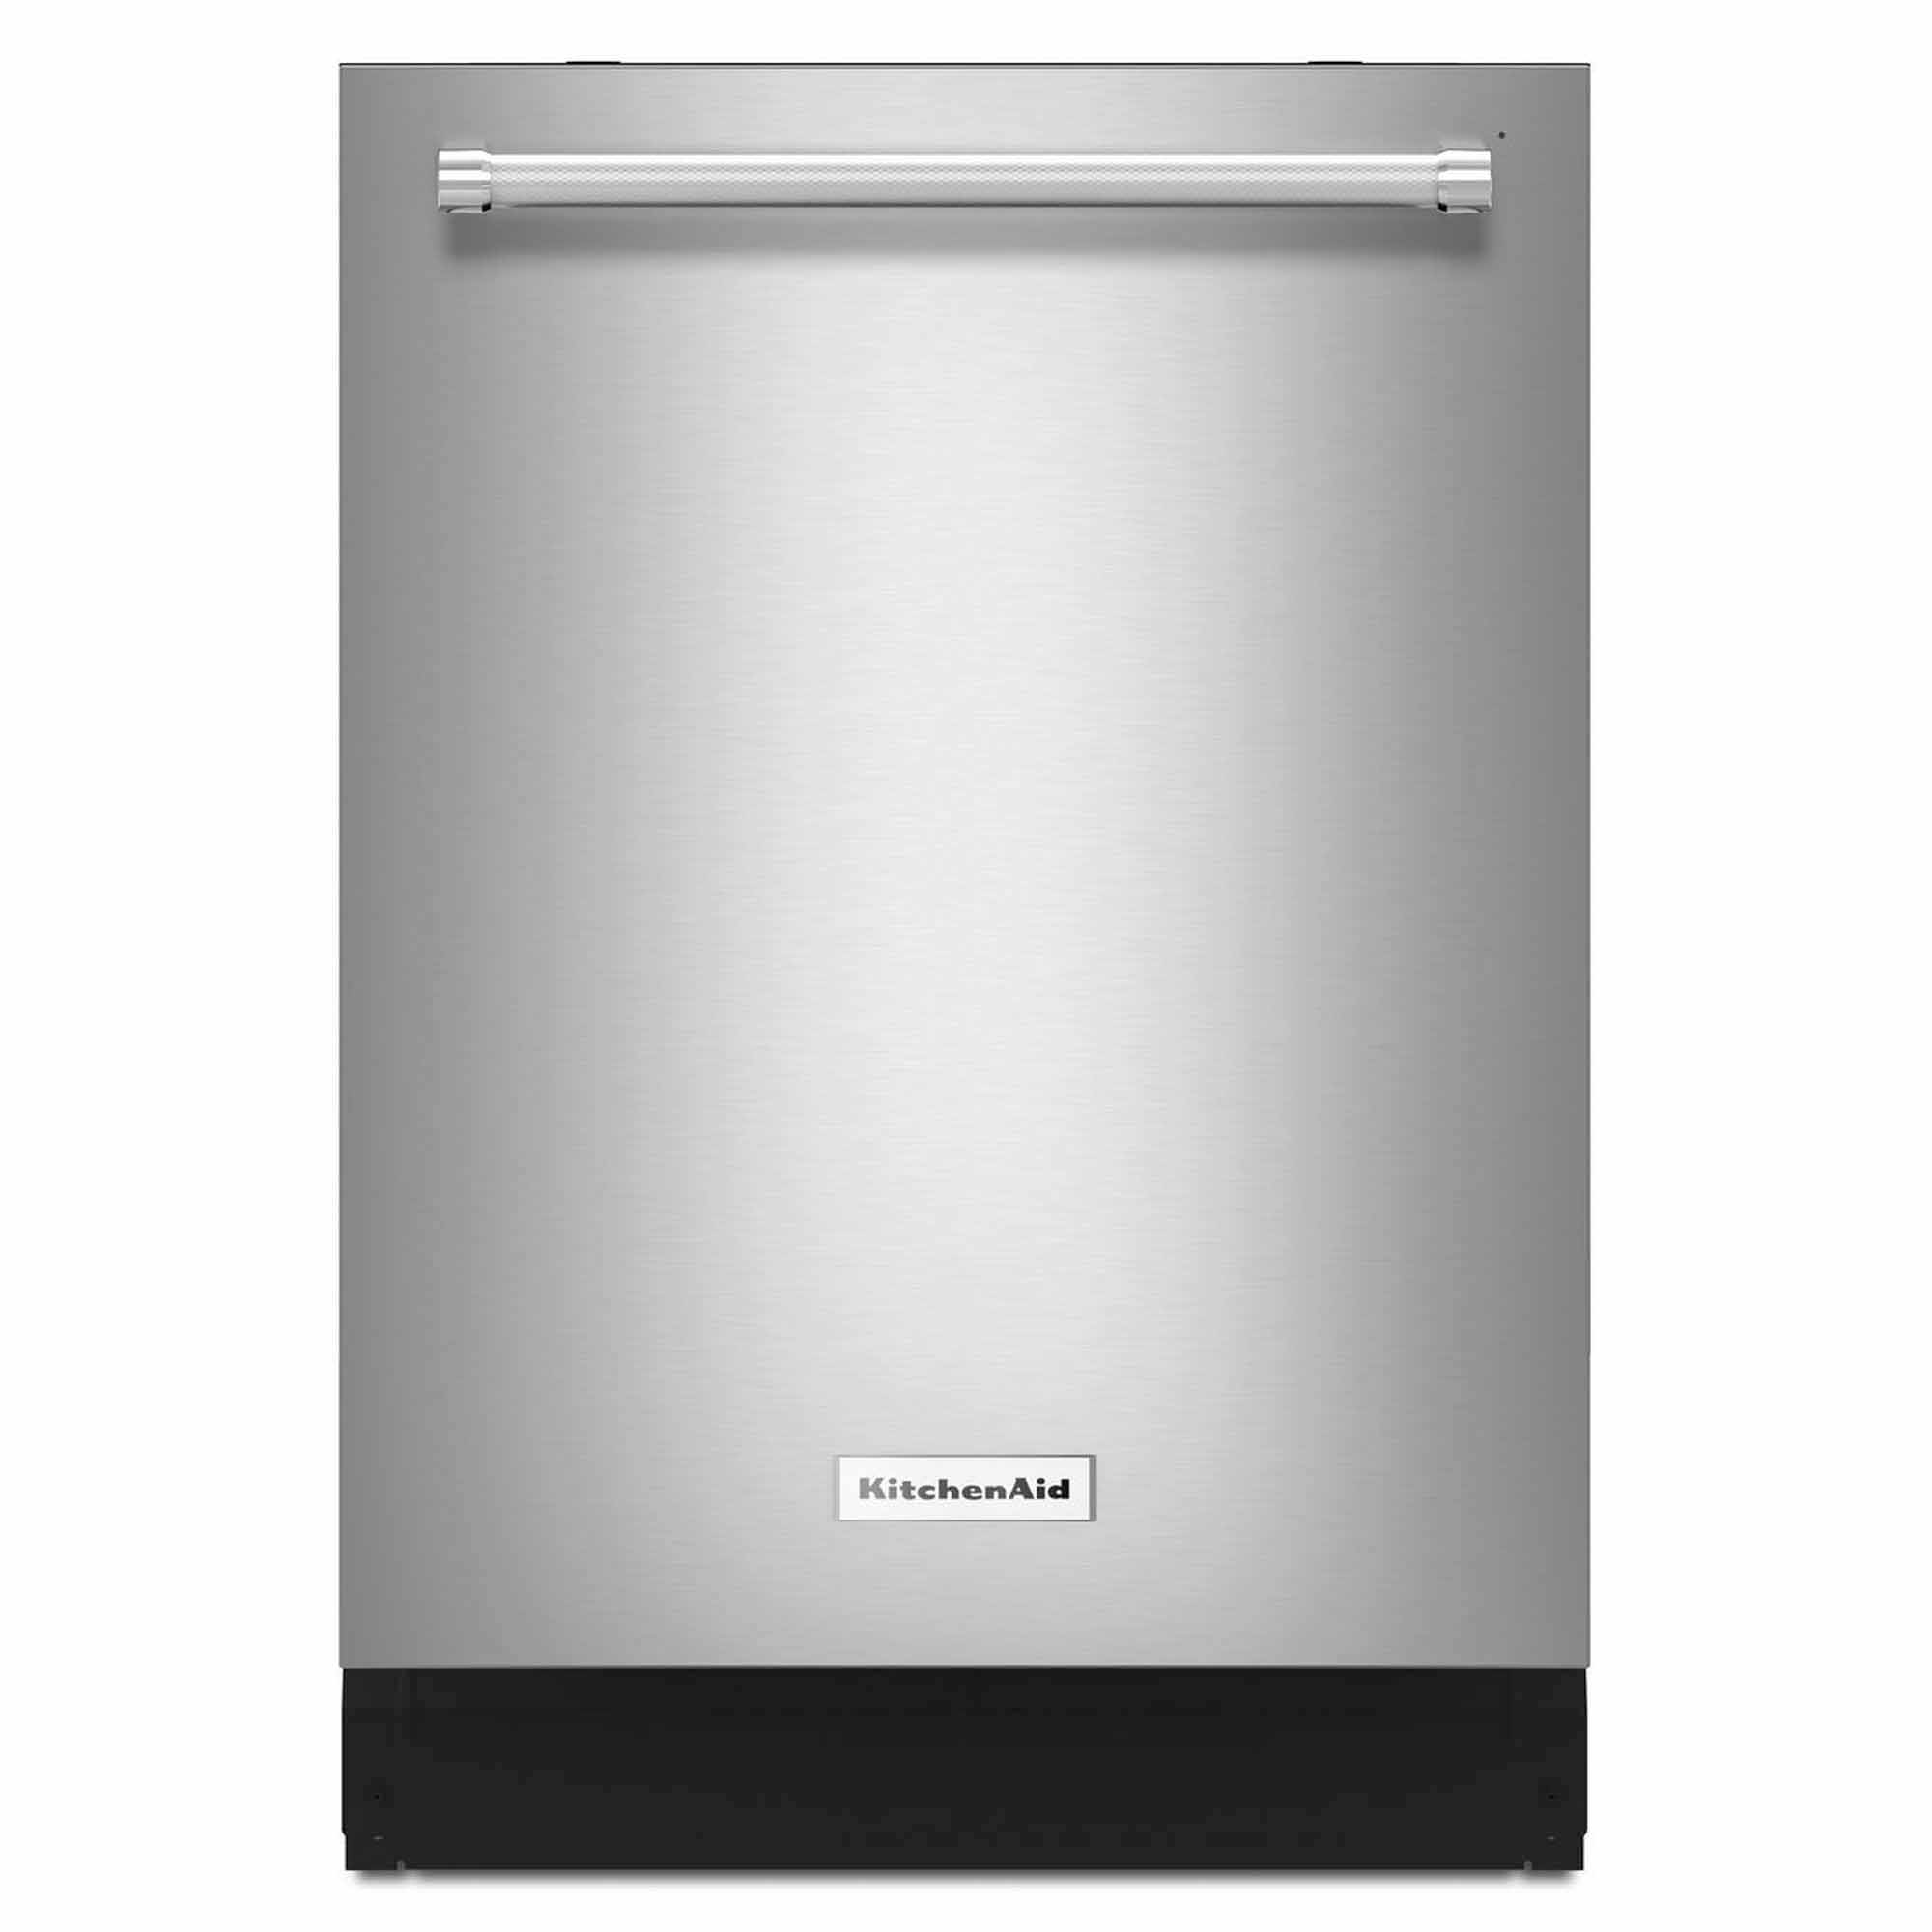 "KitchenAid KDTE104ESS 24"" Top Control BuiltIn Dishwasher"